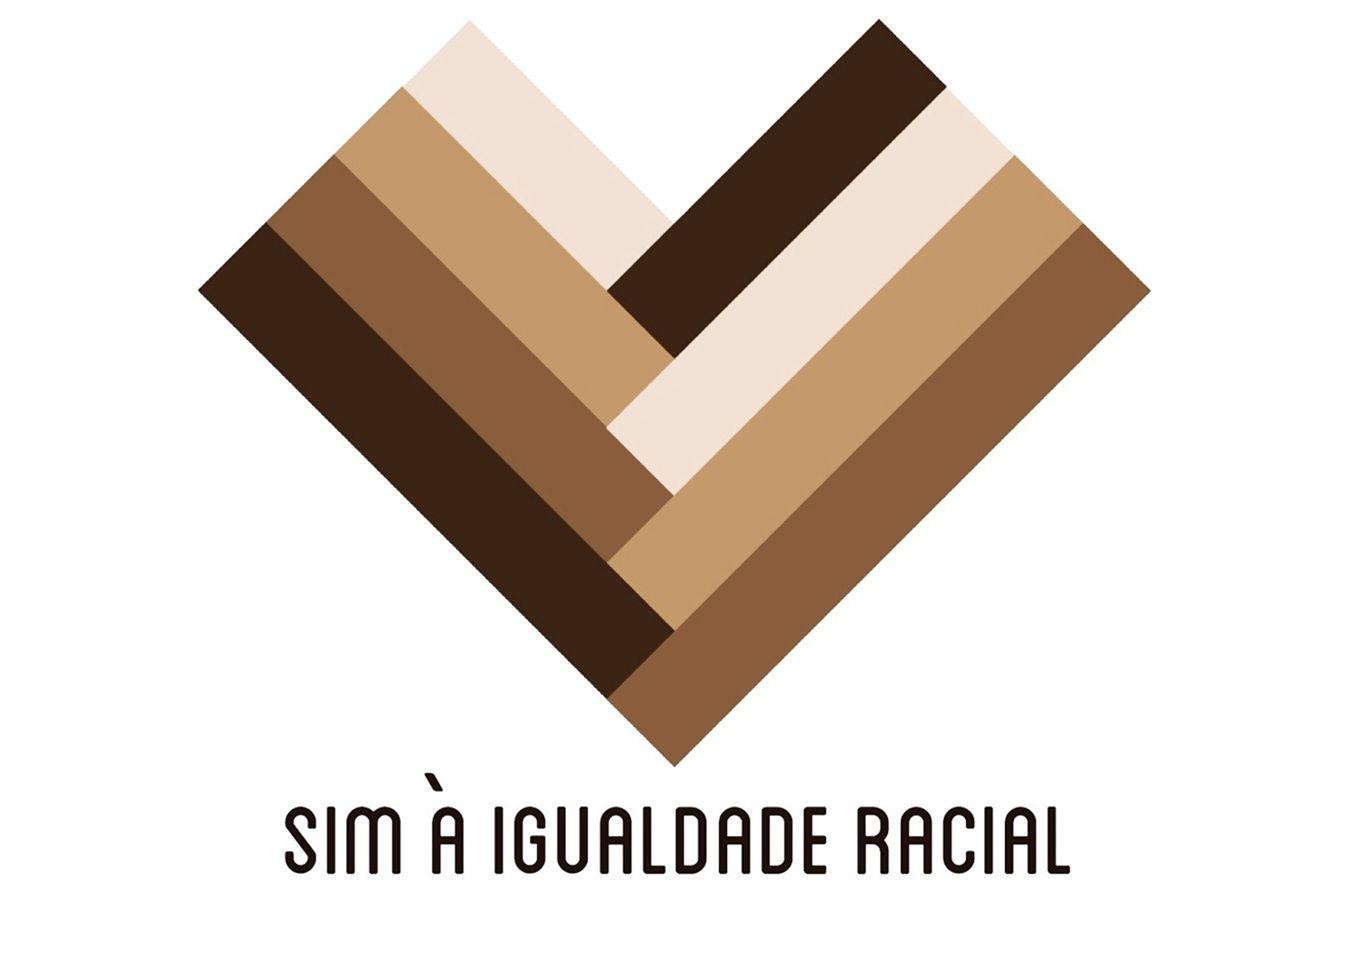 mequetrefismos-logo-do-instituto-identidades-do-brasil_0